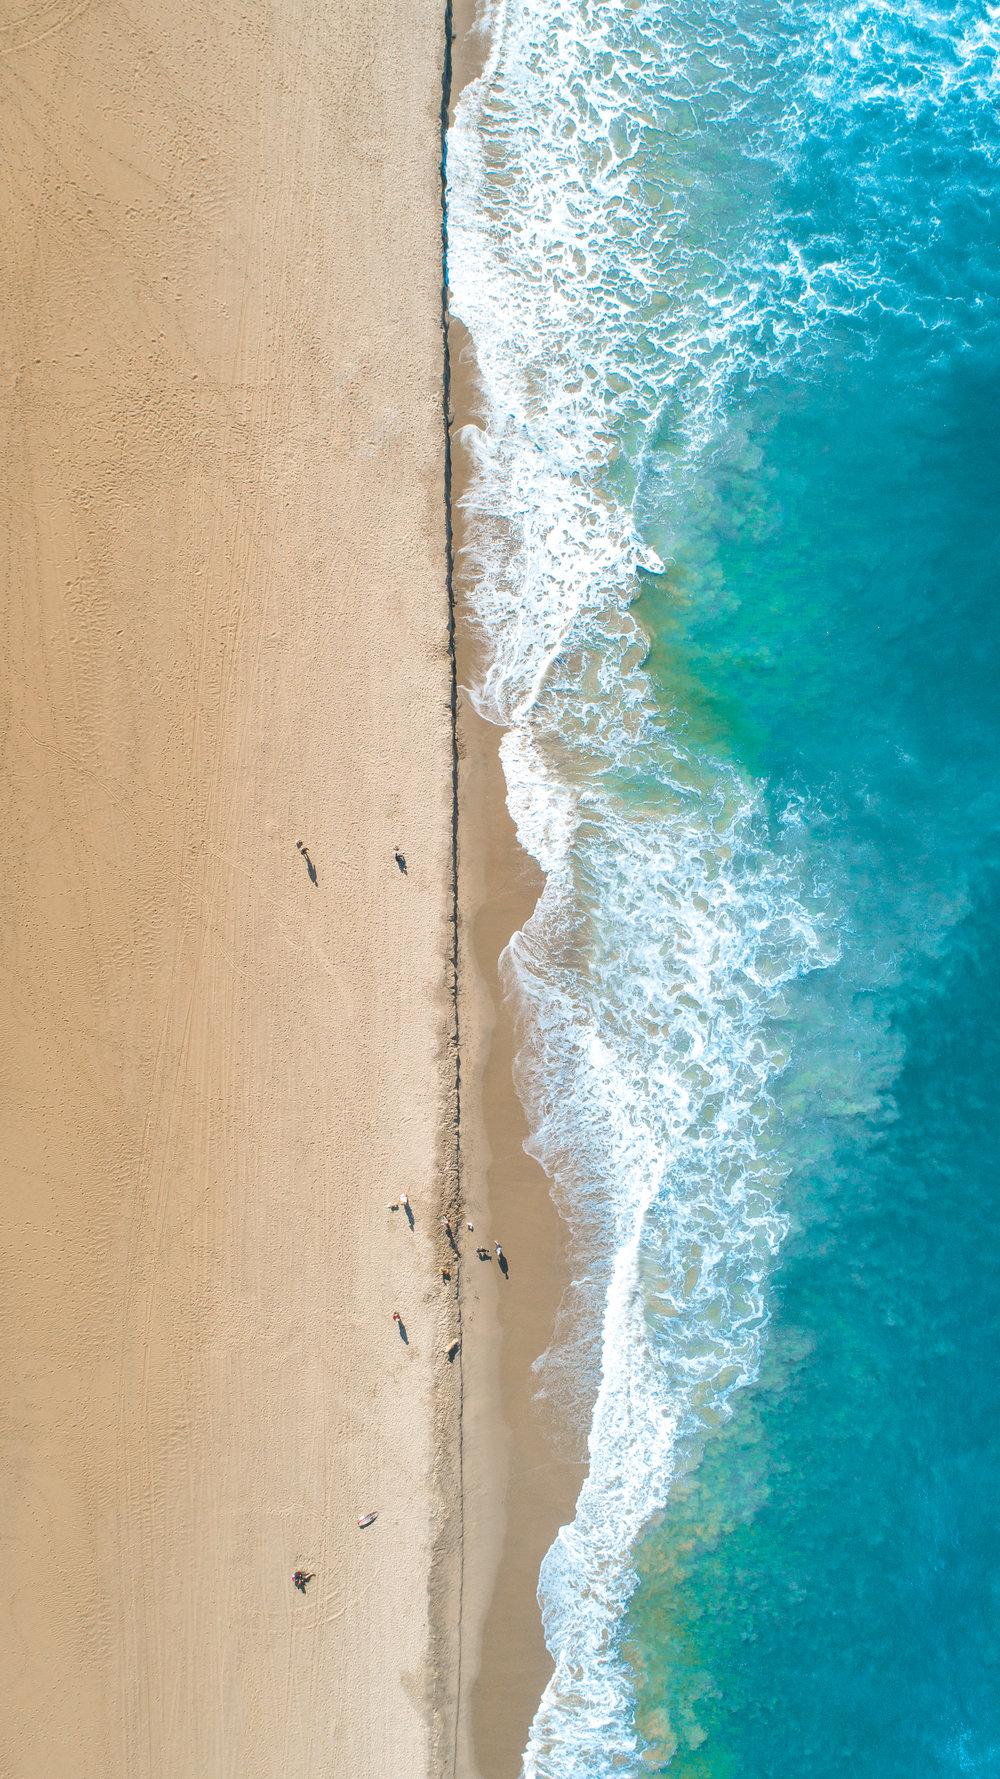 ABE1_Drone_Newport_Beach-7.jpg